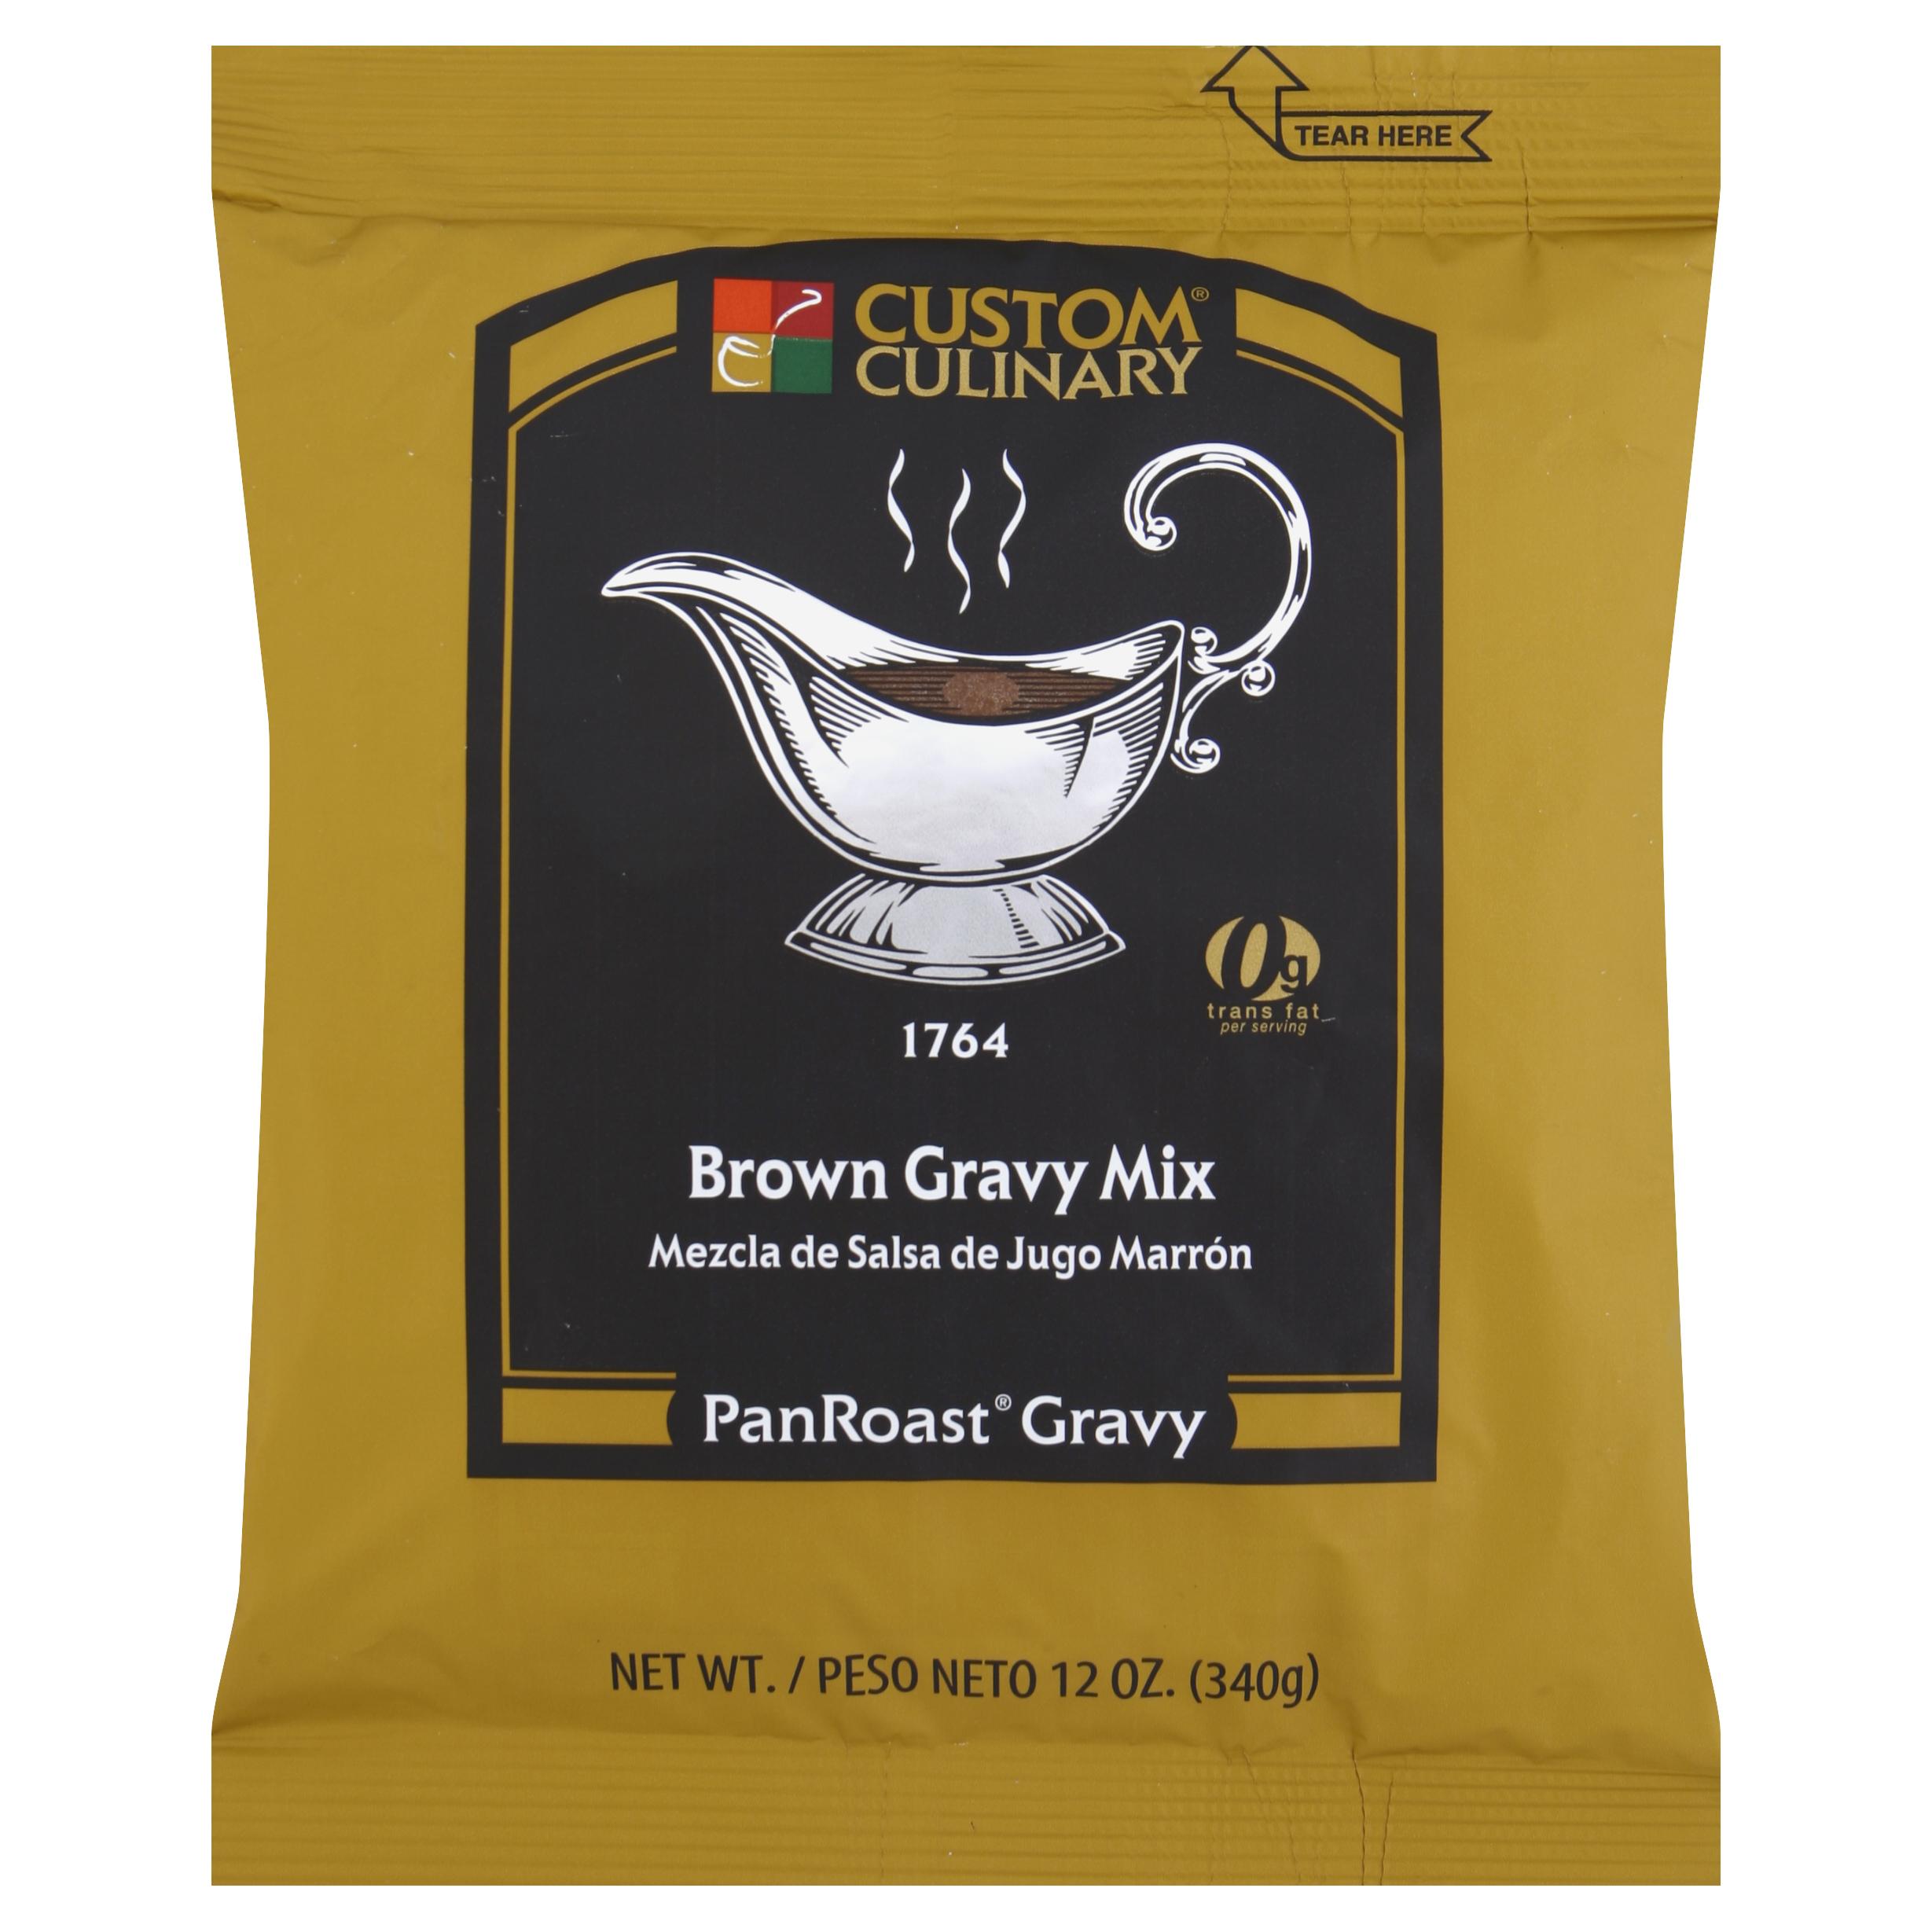 1764 - PanRoast Brown Gravy Mix